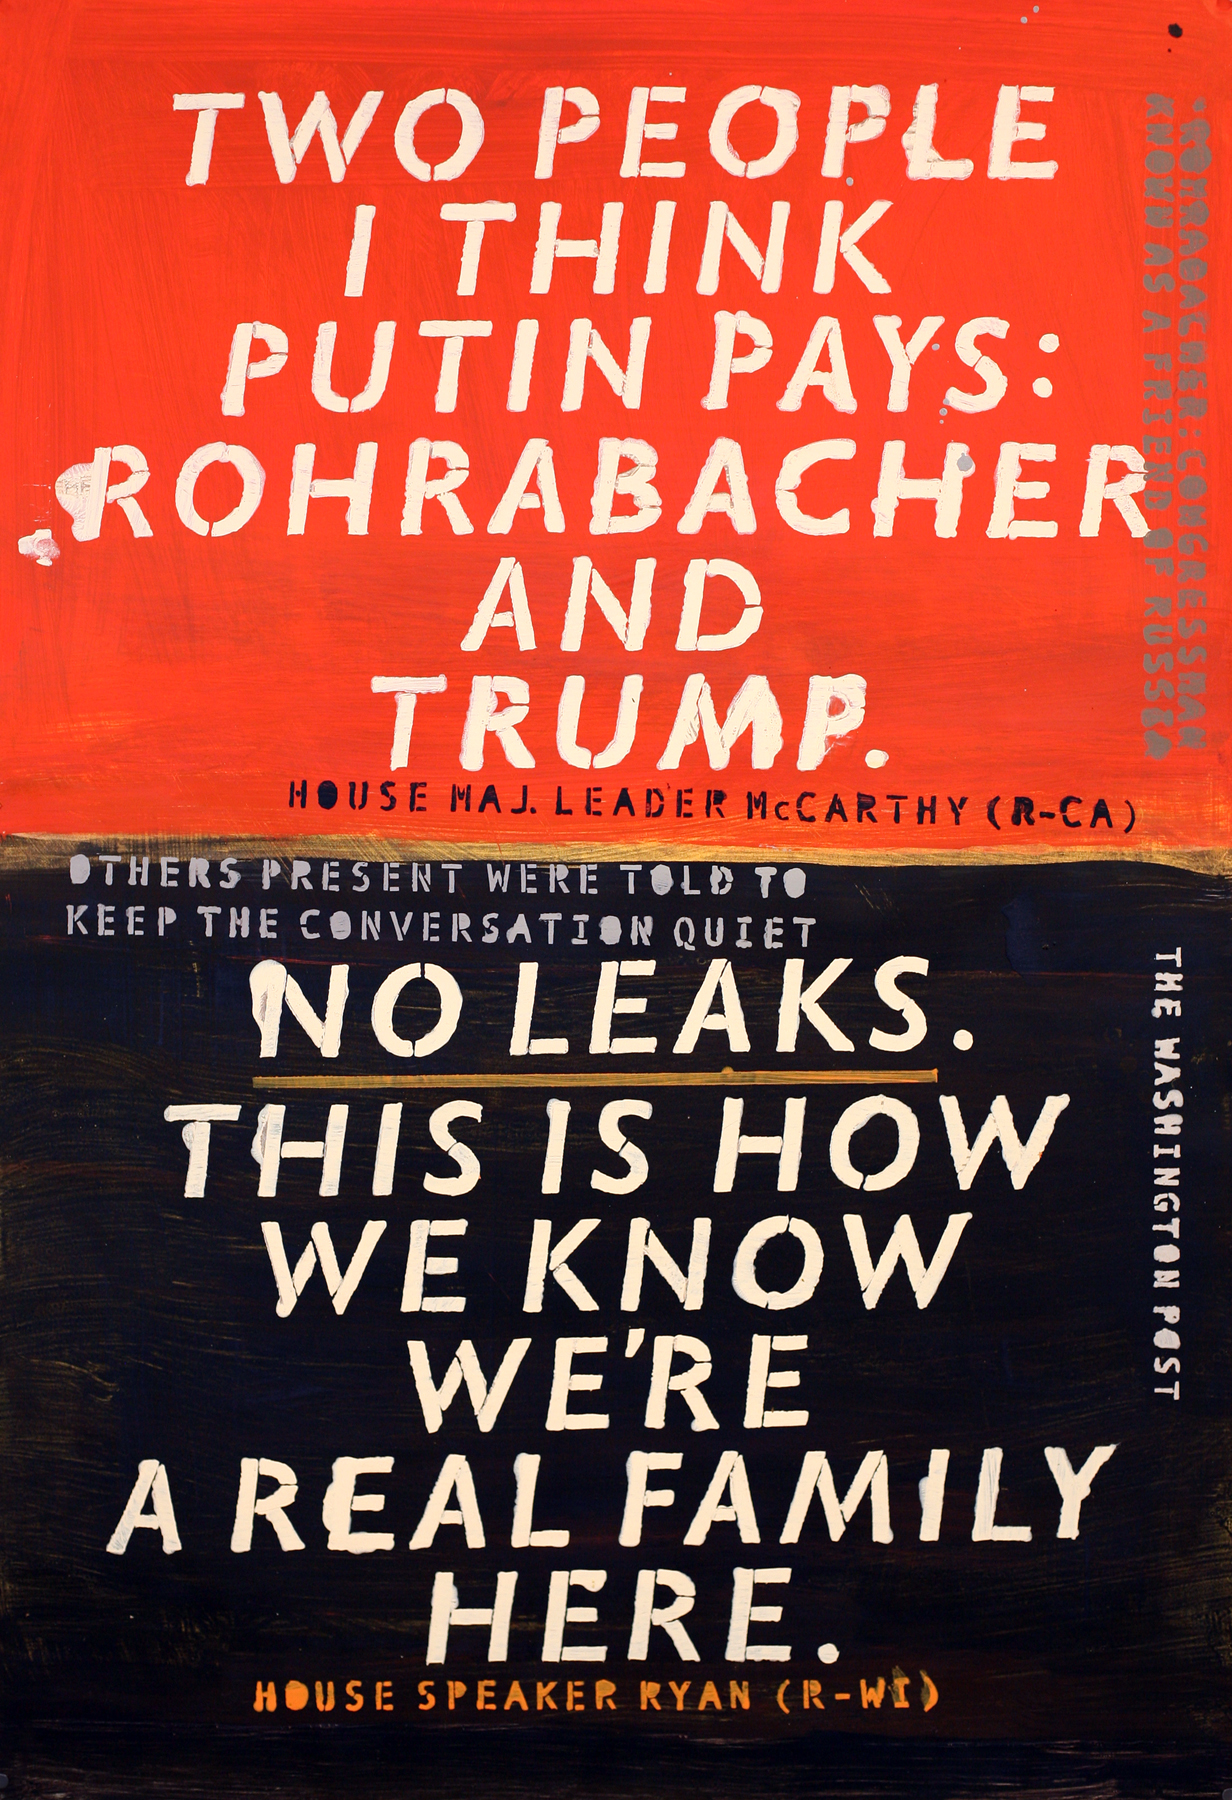 Putin, Trump, and Rohrabacher